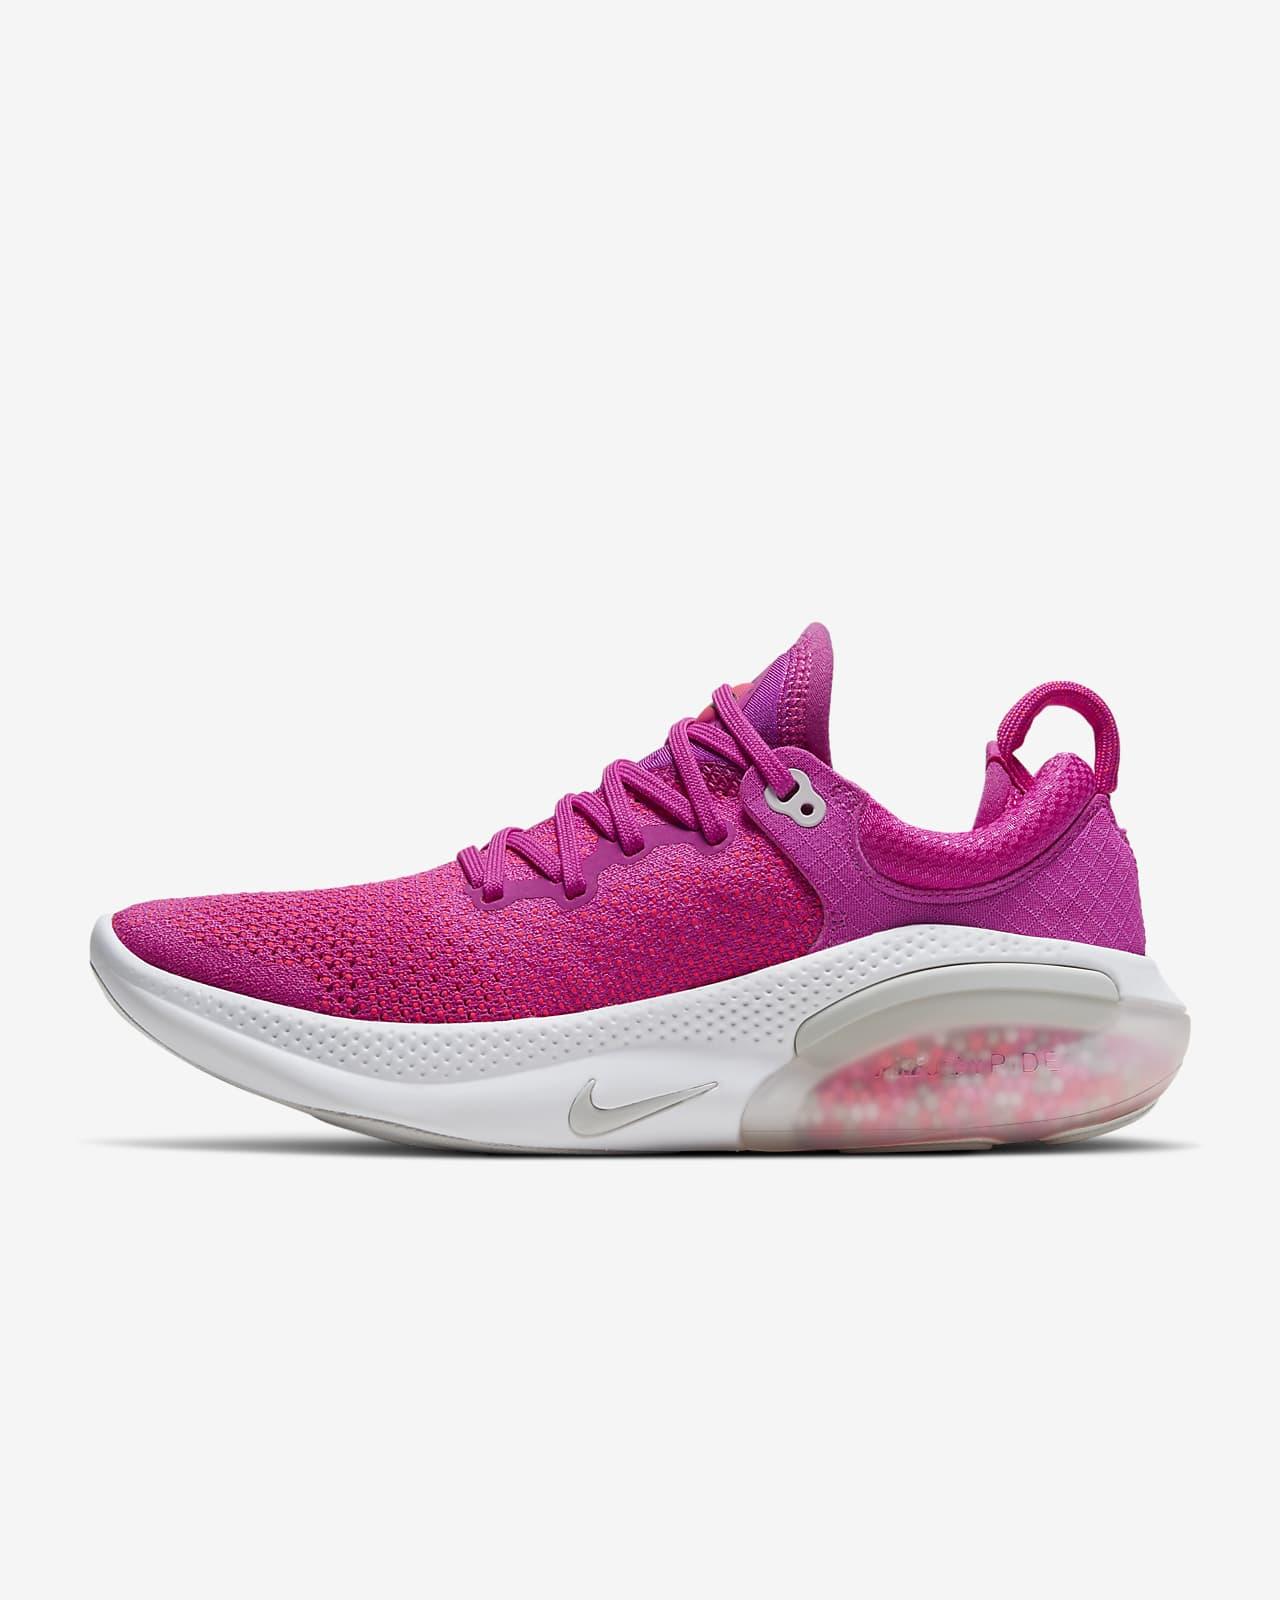 Nike Joyride Run Flyknit 女款跑鞋